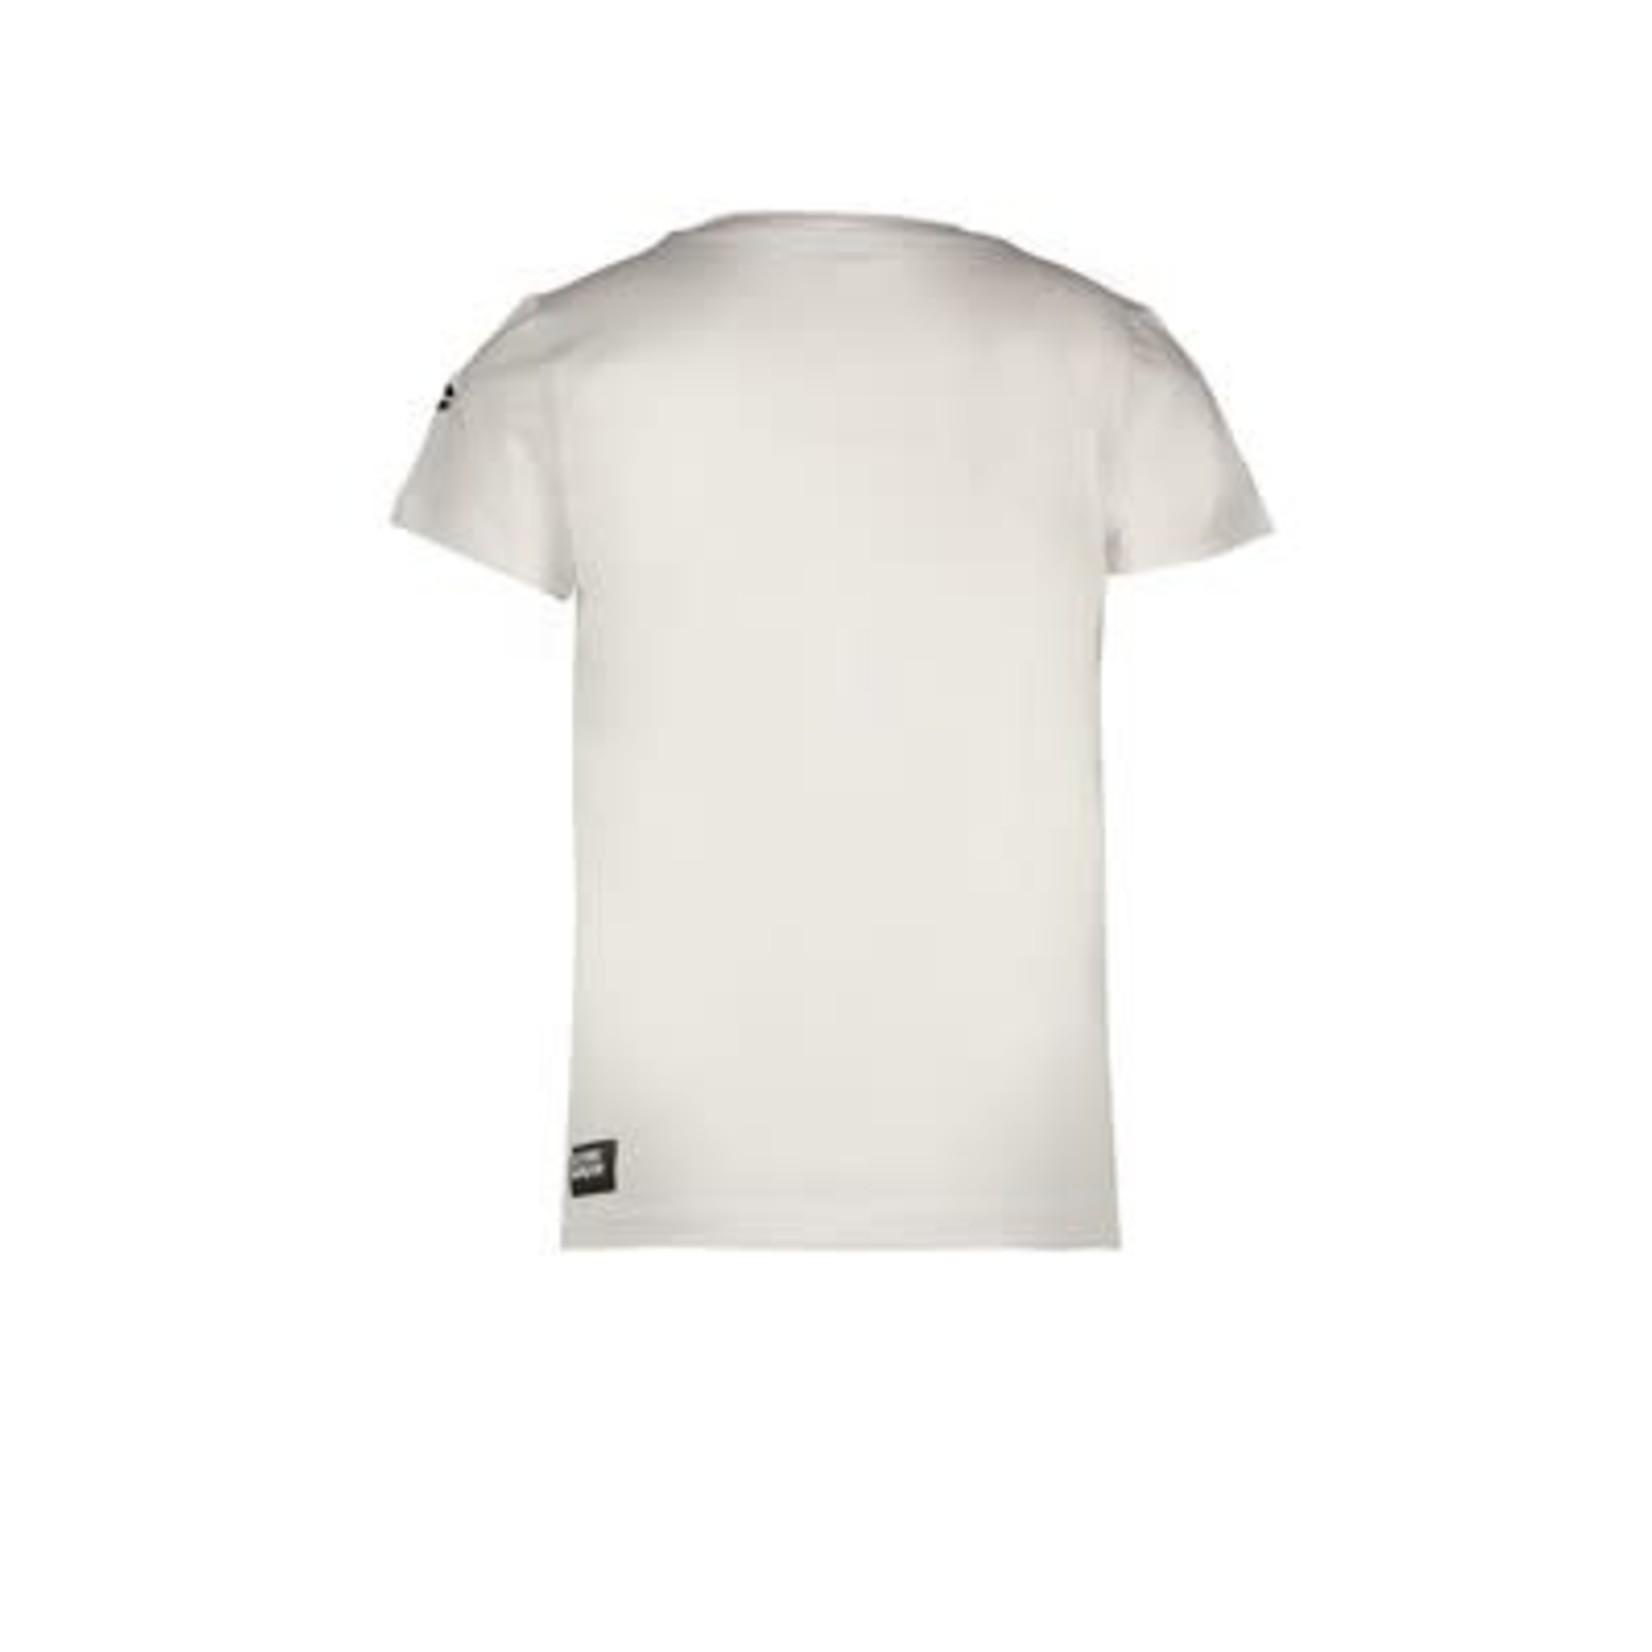 "Le Chic Garçon T-shirt Garçon ""charming boy"""